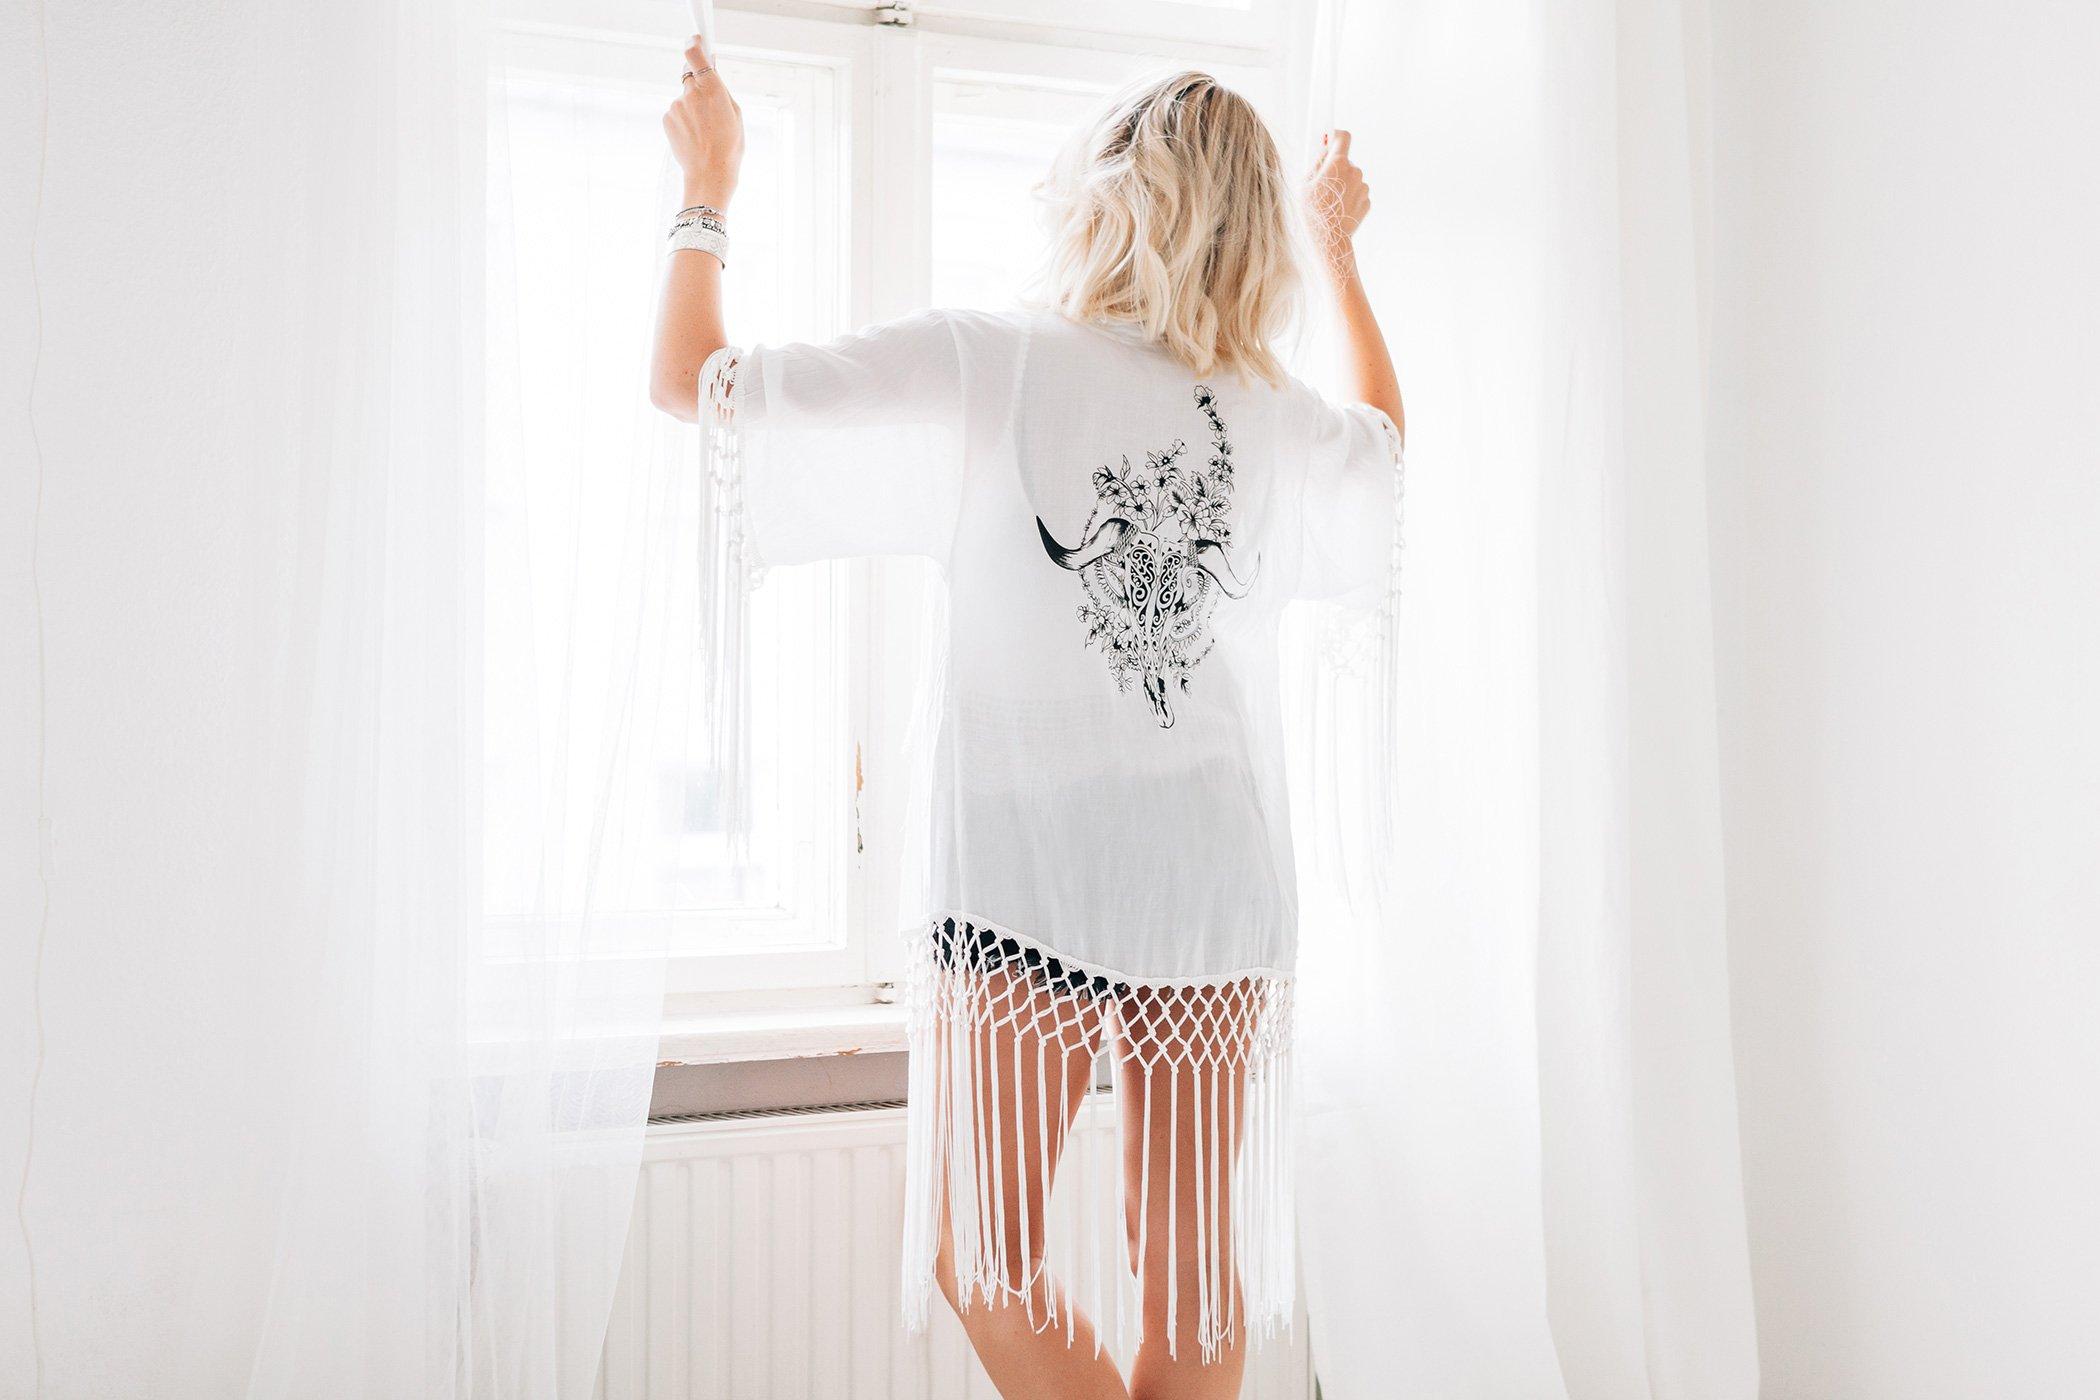 mikuta-wearing-white-kimono-and-shorts-17